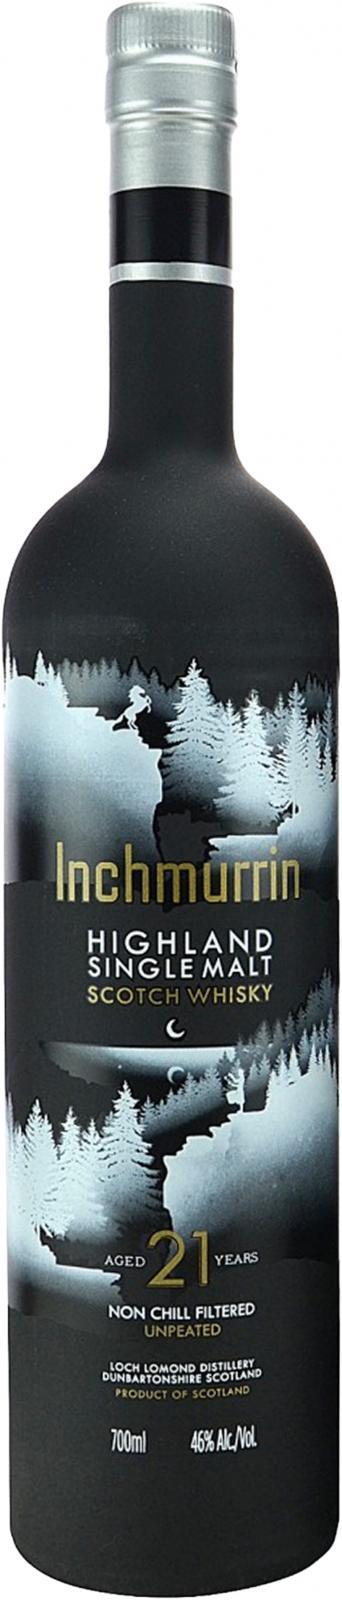 Inchmurrin 21-year-old